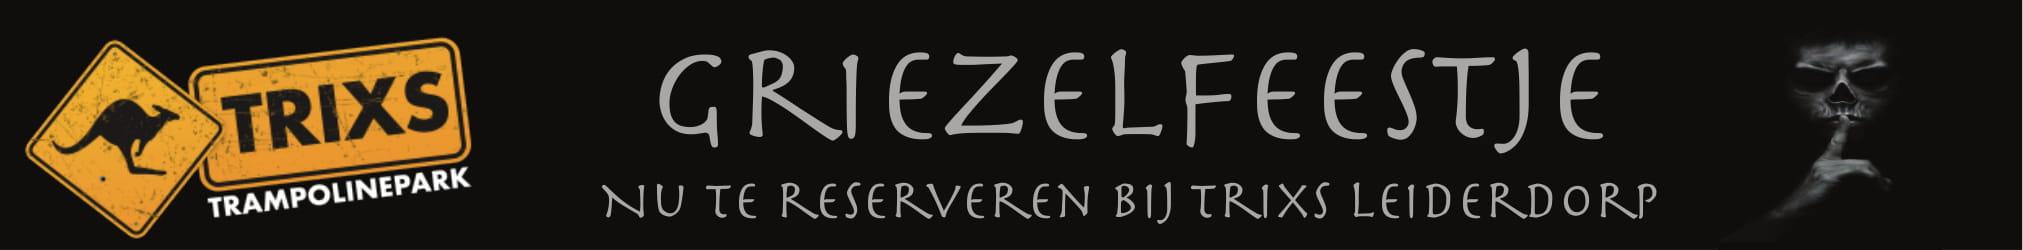 Griezelfeest banner